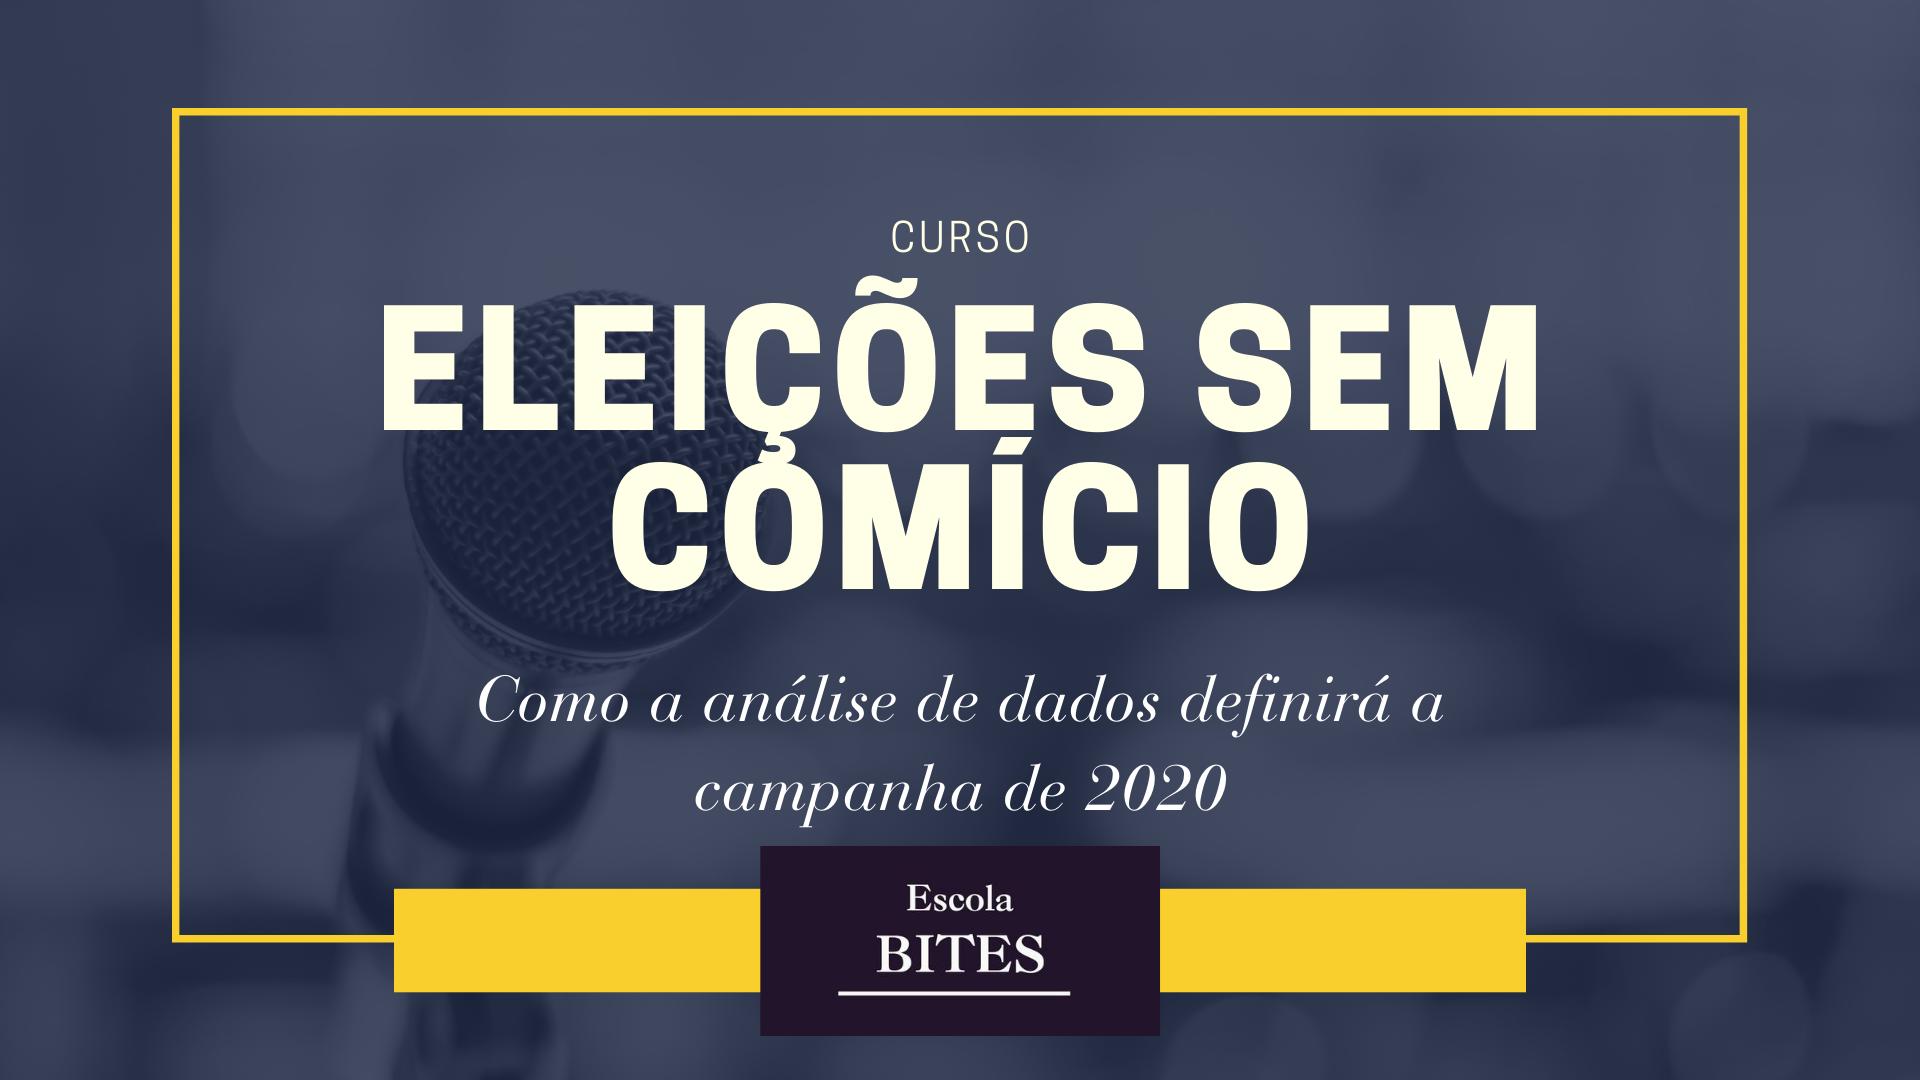 Escola BITES abre curso sobre análise de dados na campanha eleitoral